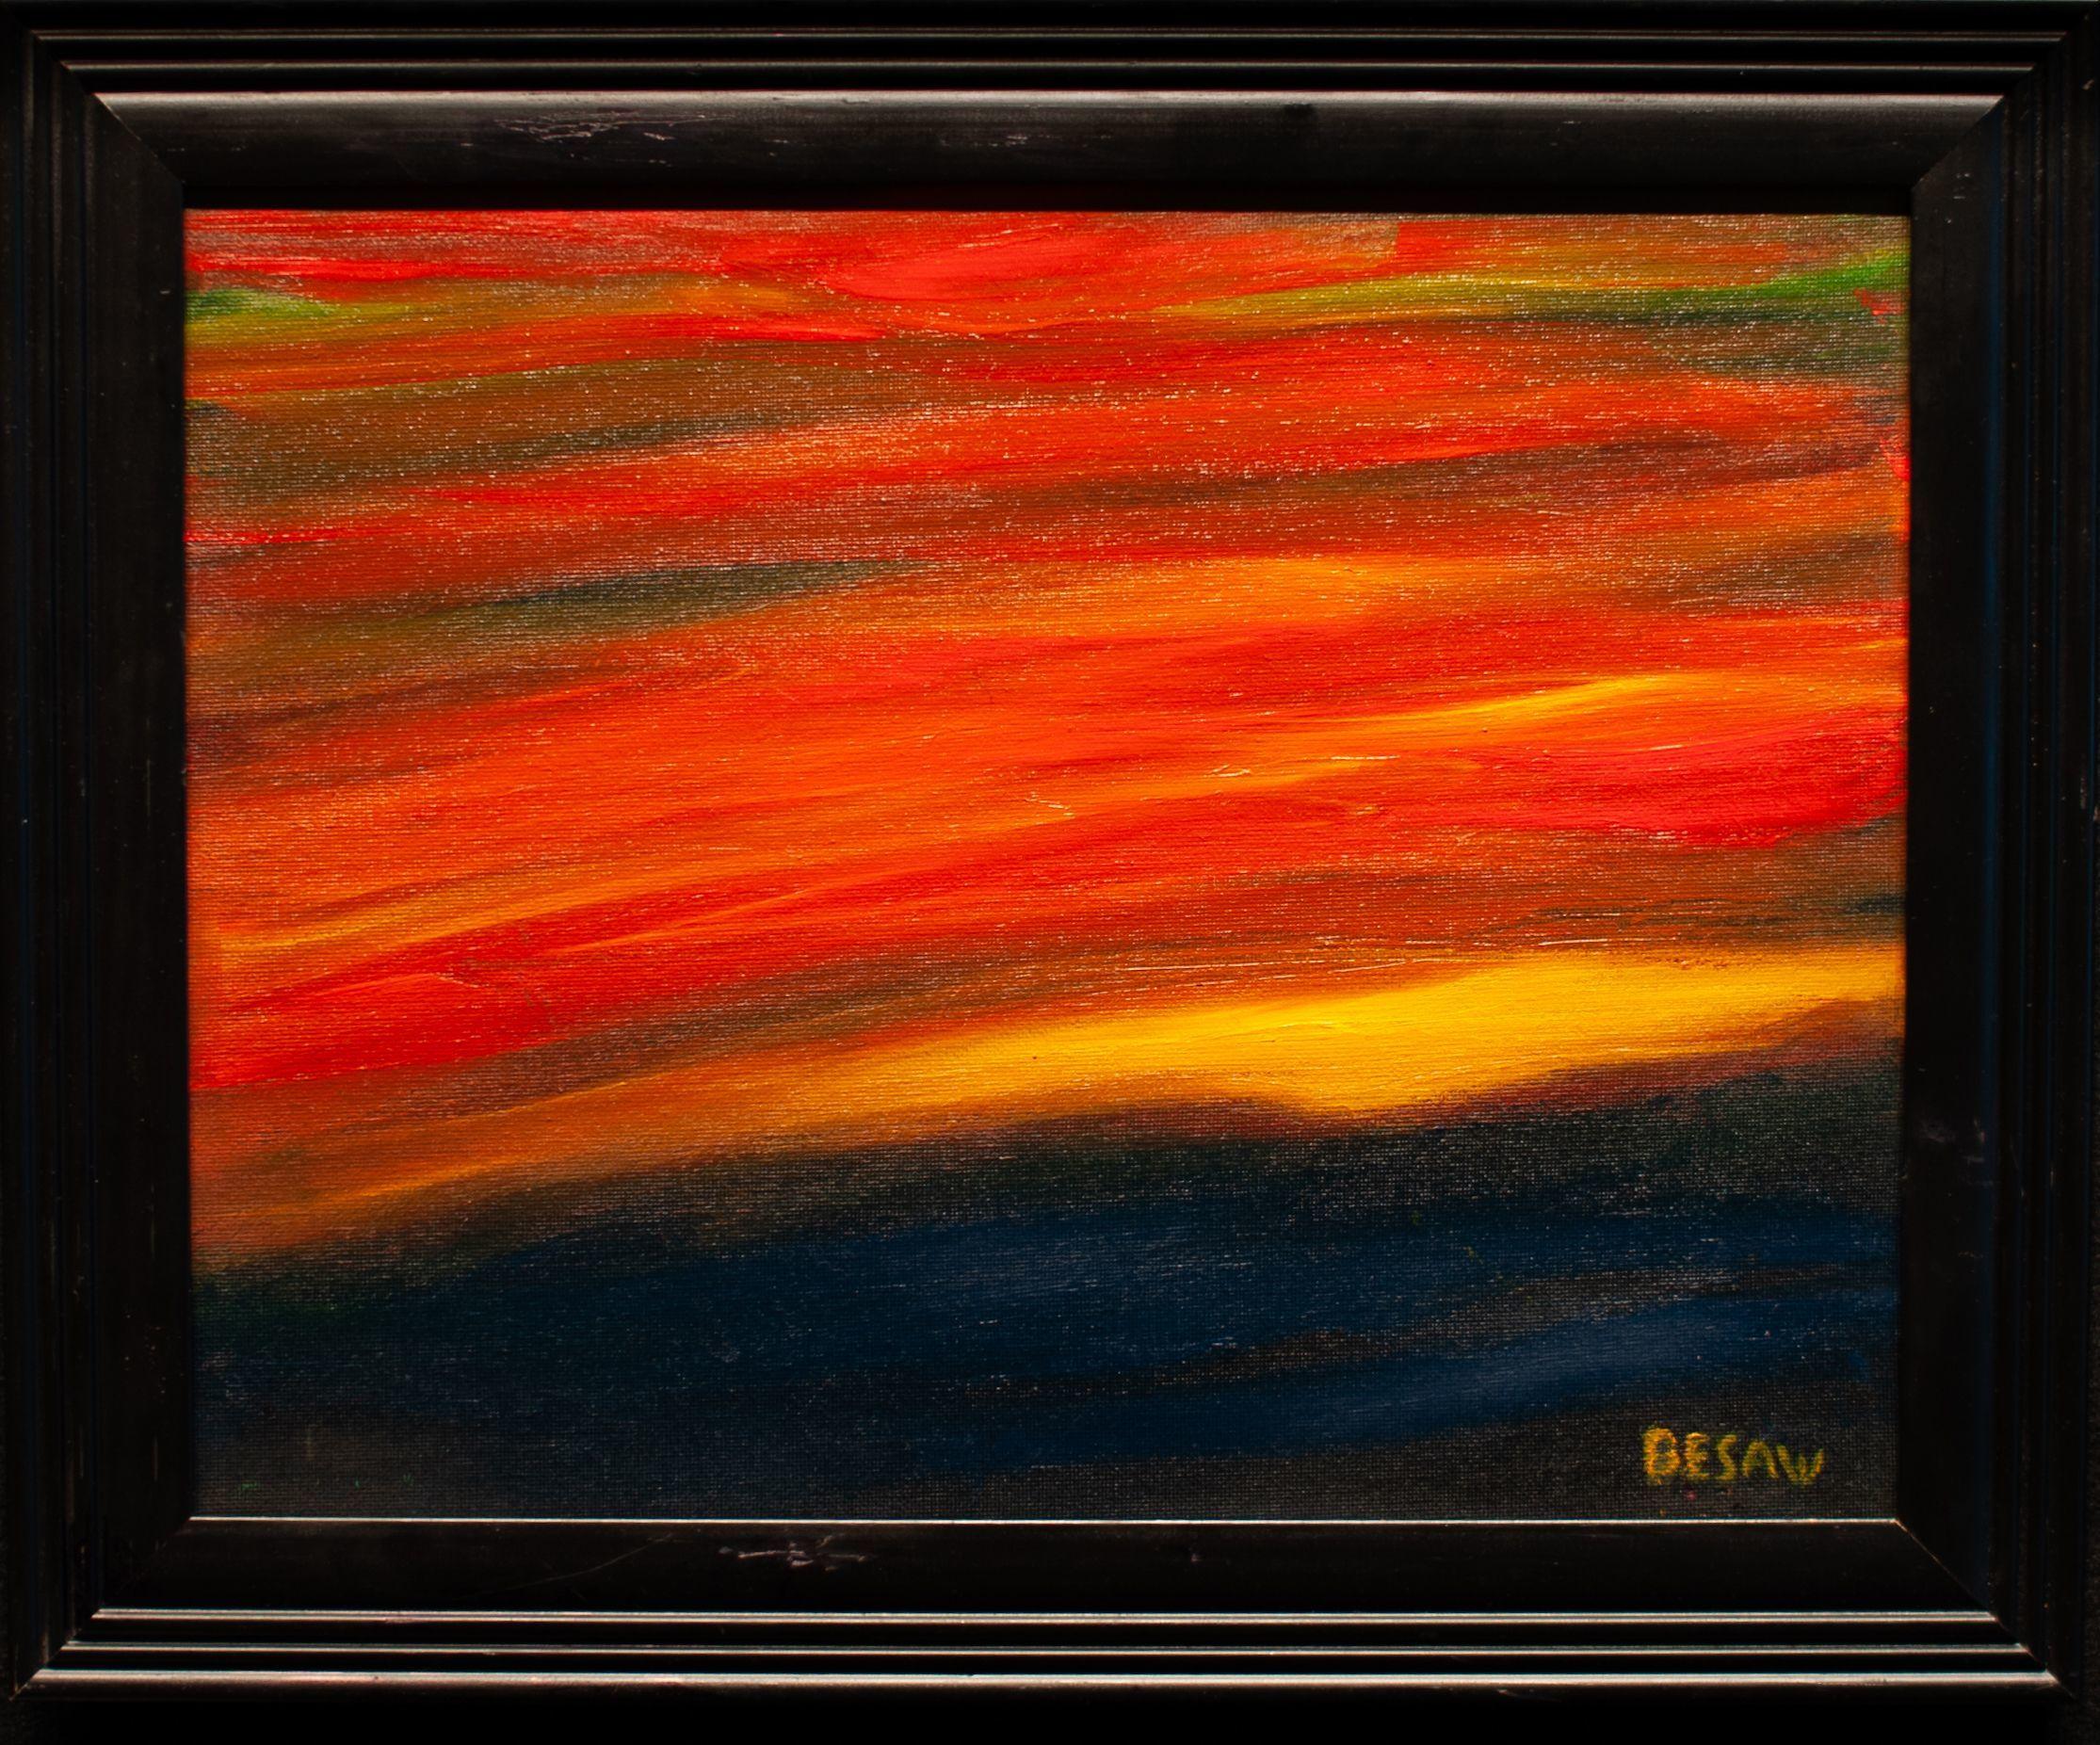 """Evening"" - Phyllis Besaw"